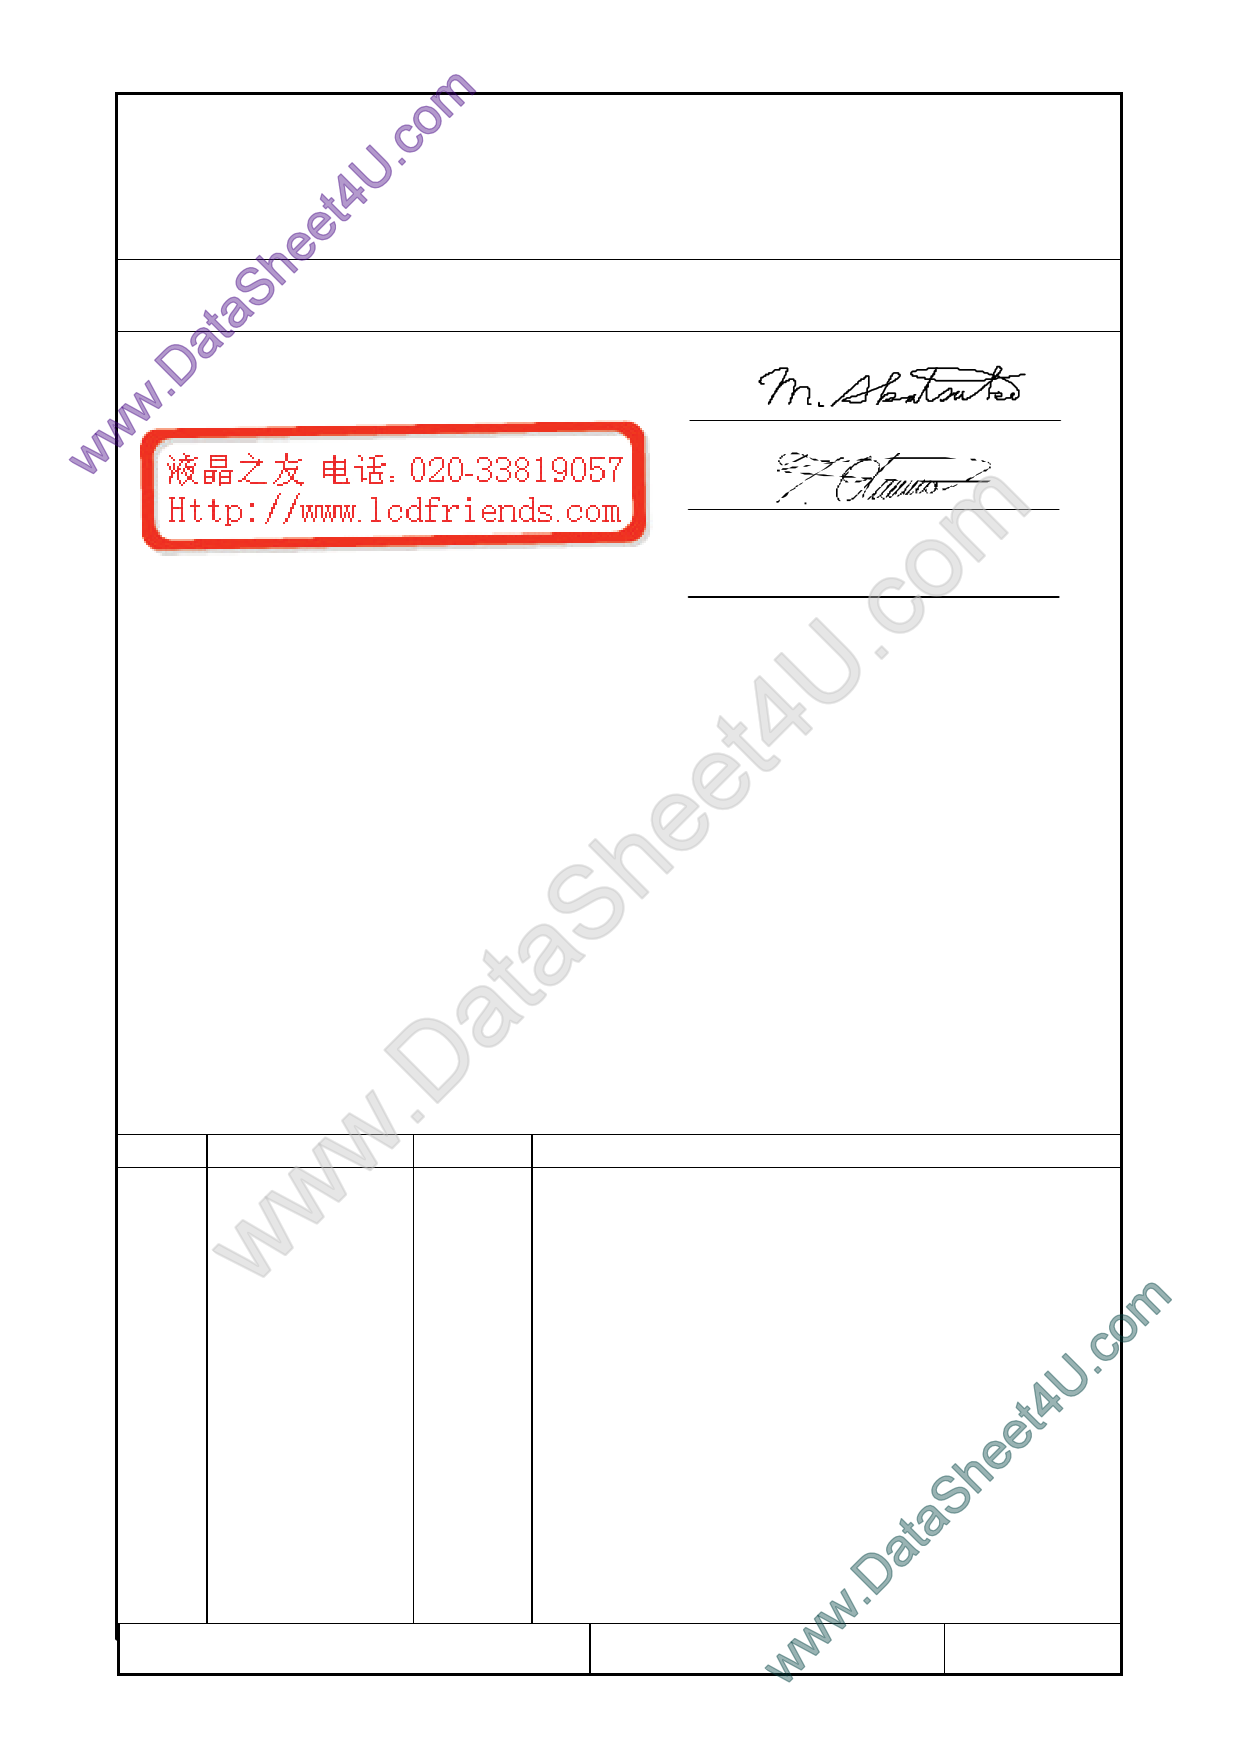 F-51852GNFQJ-LY-ADN Hoja de datos, Descripción, Manual